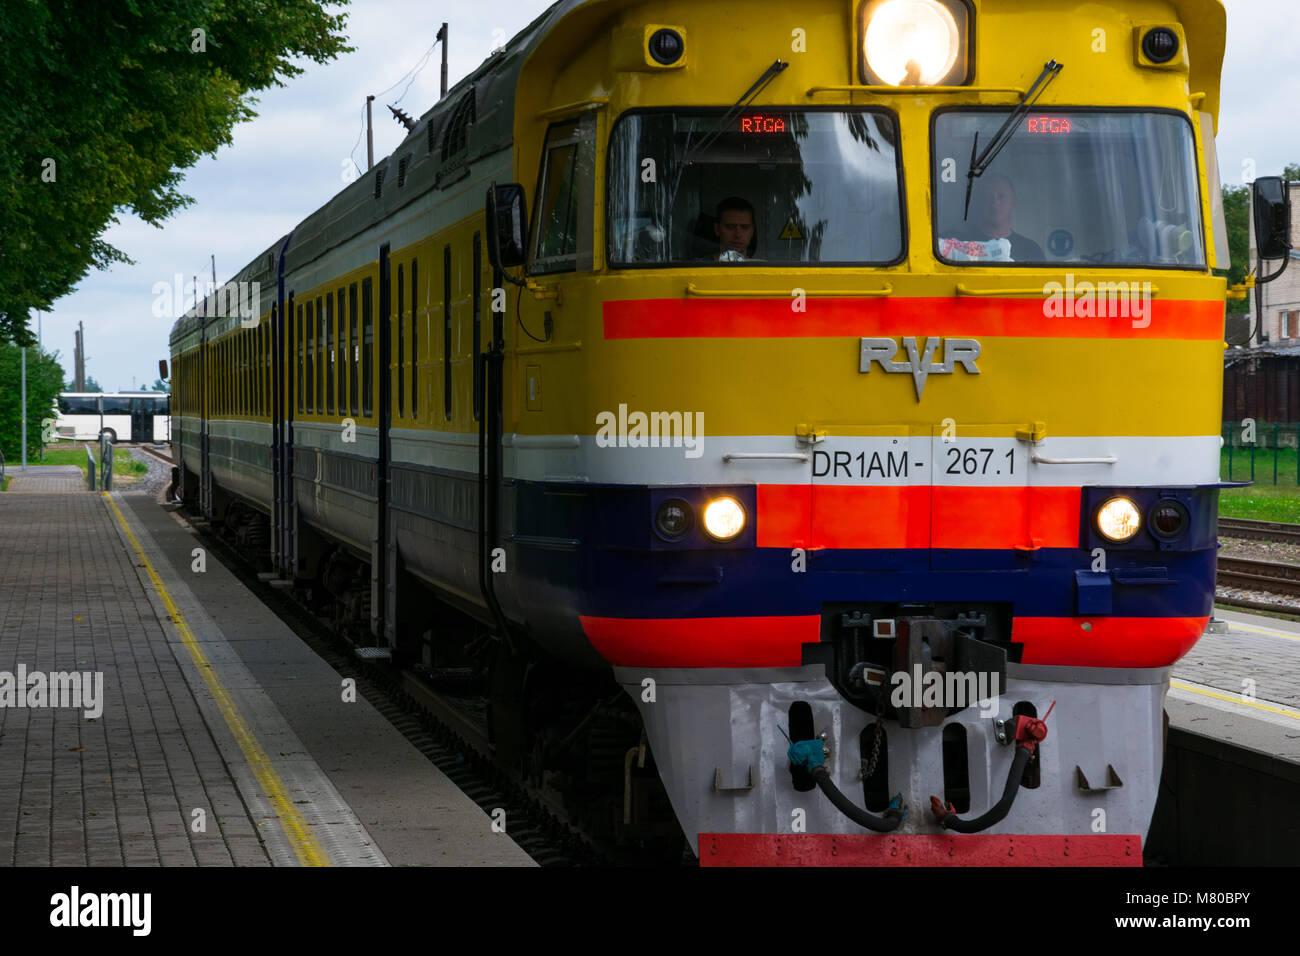 Cesis, Latvia. August 24, 2017. Train arriving at Cesis Railway Station - Stock Image